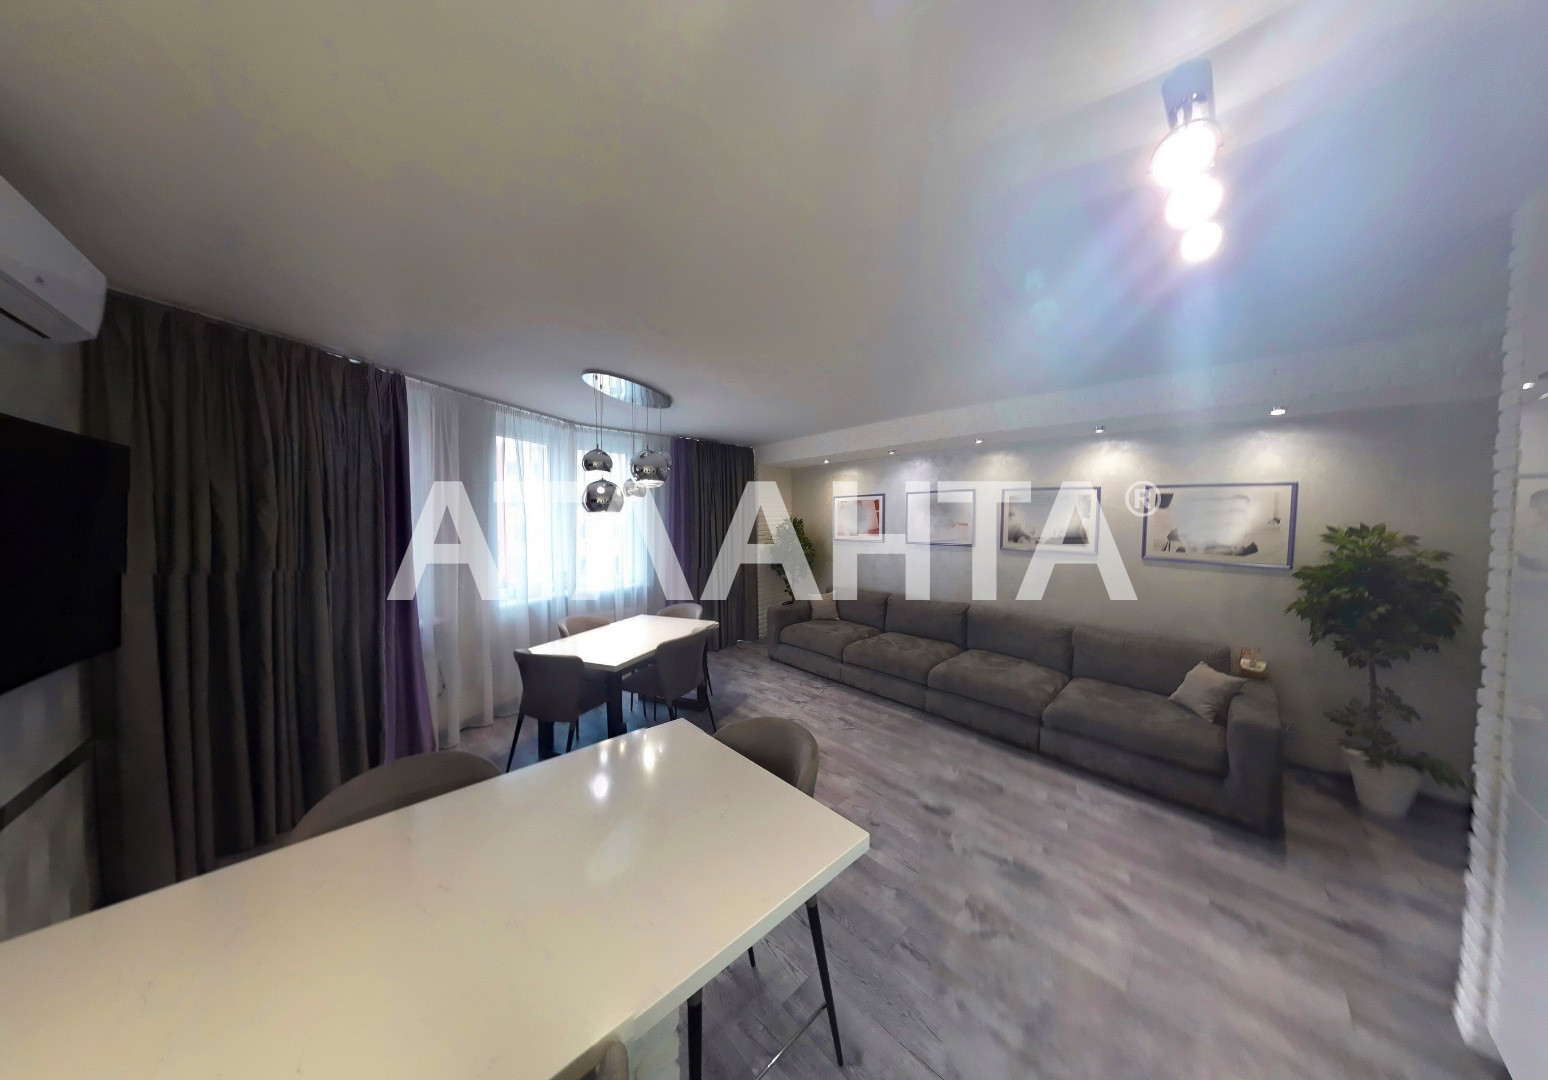 Продается 3-комнатная Квартира на ул. Ул. Ломоносова  — 220 000 у.е. (фото №12)